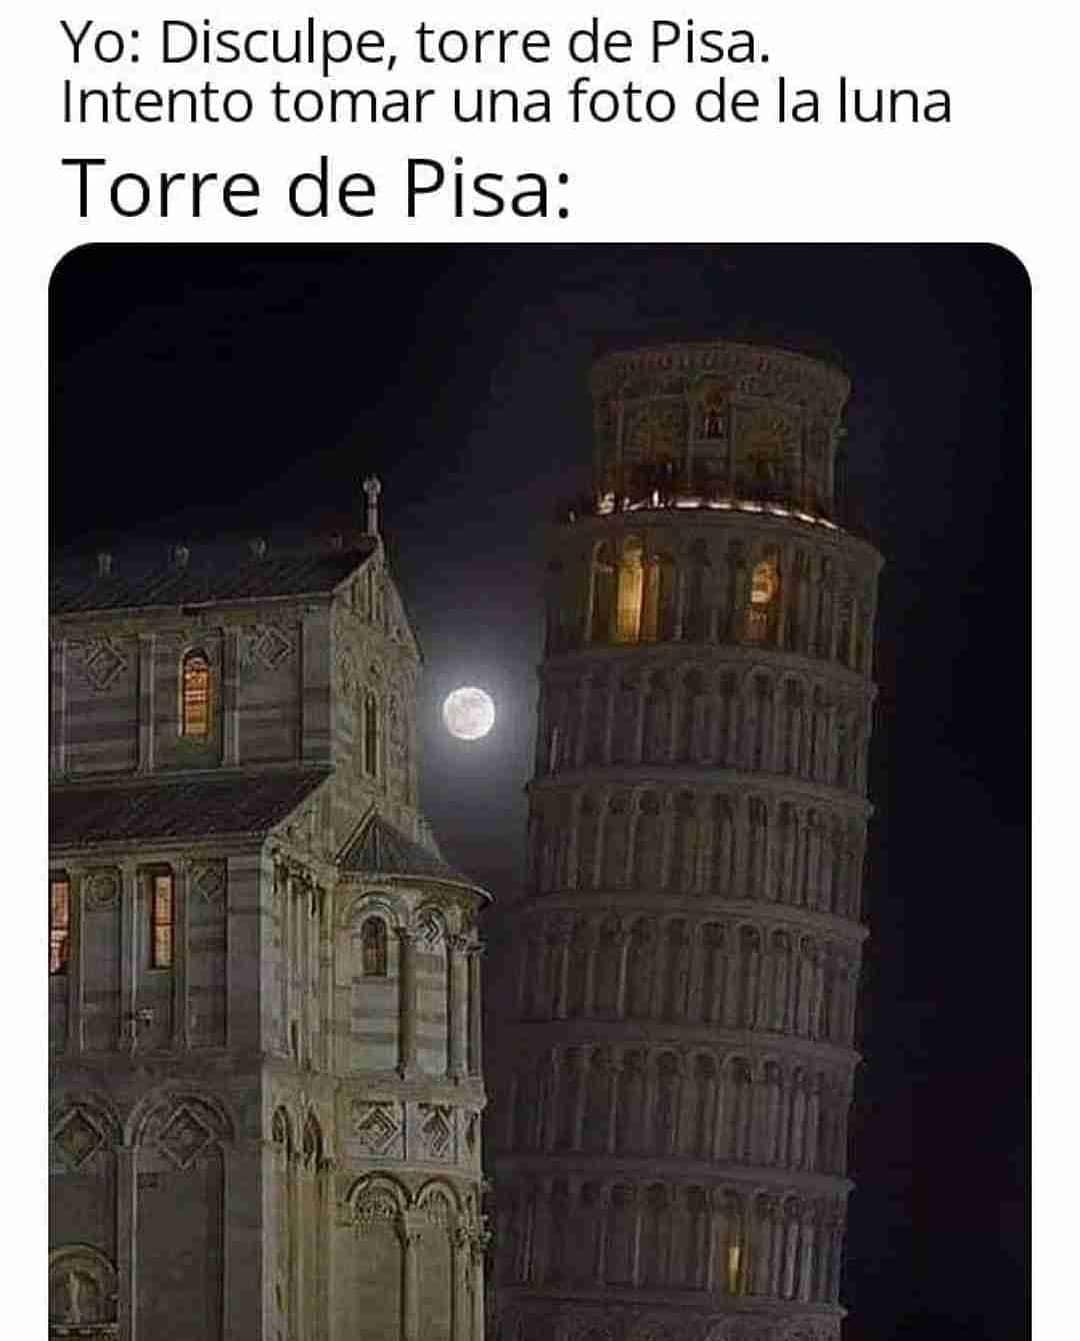 Yo: Disculpe, torre de Pisa. Intento tomar una foto de la luna.  Torre de Pisa: